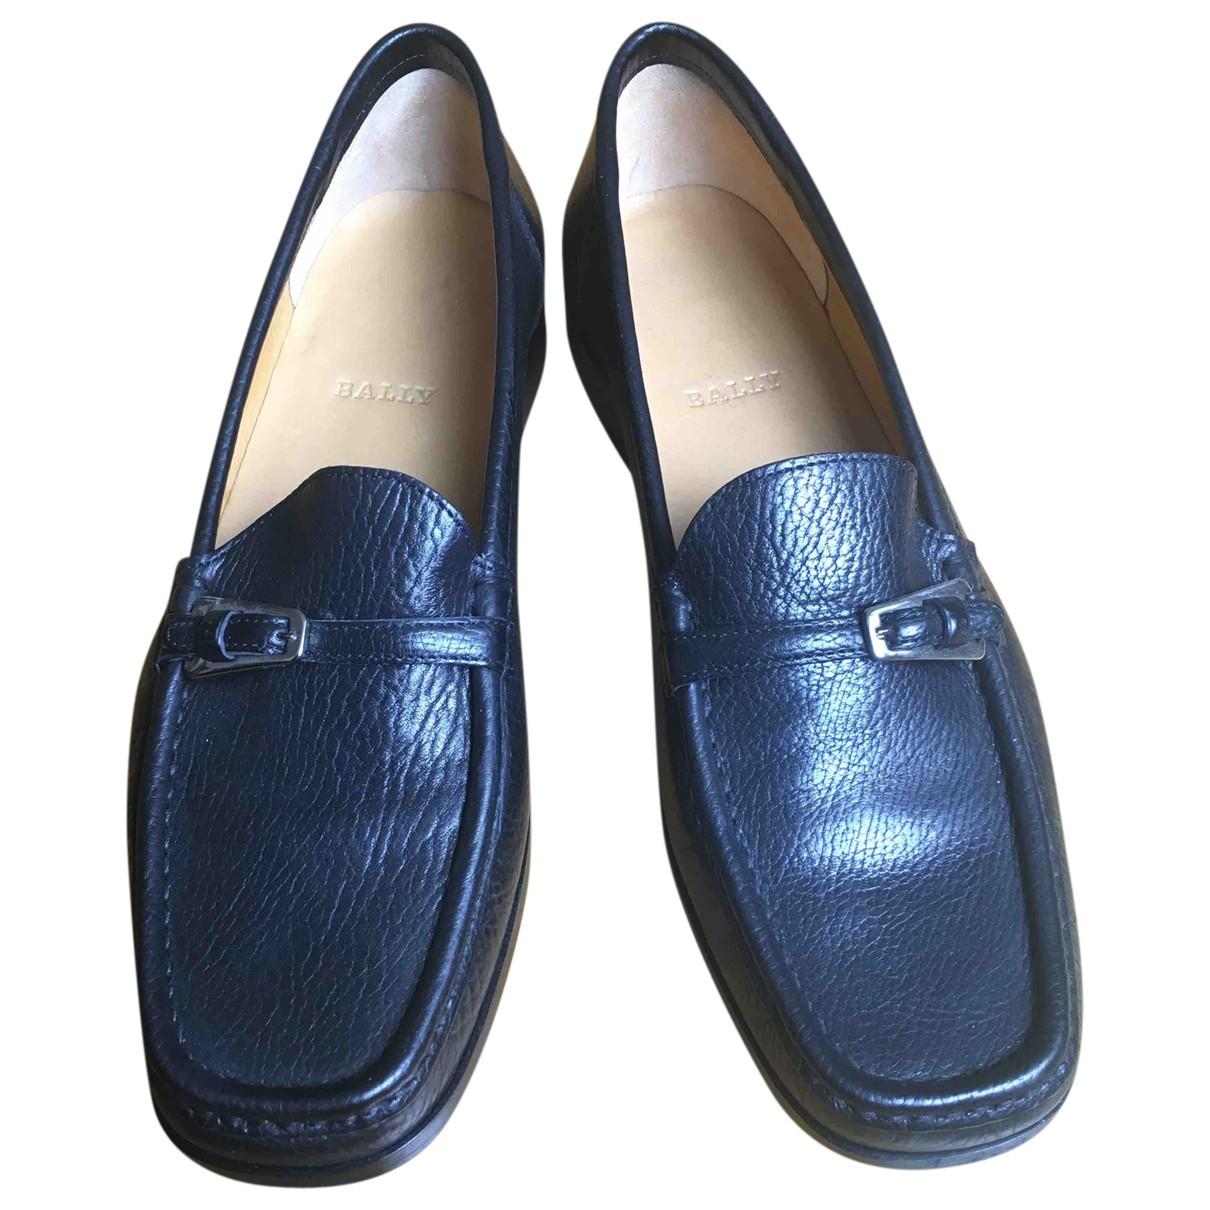 Bally \N Black Leather Flats for Women 39 EU